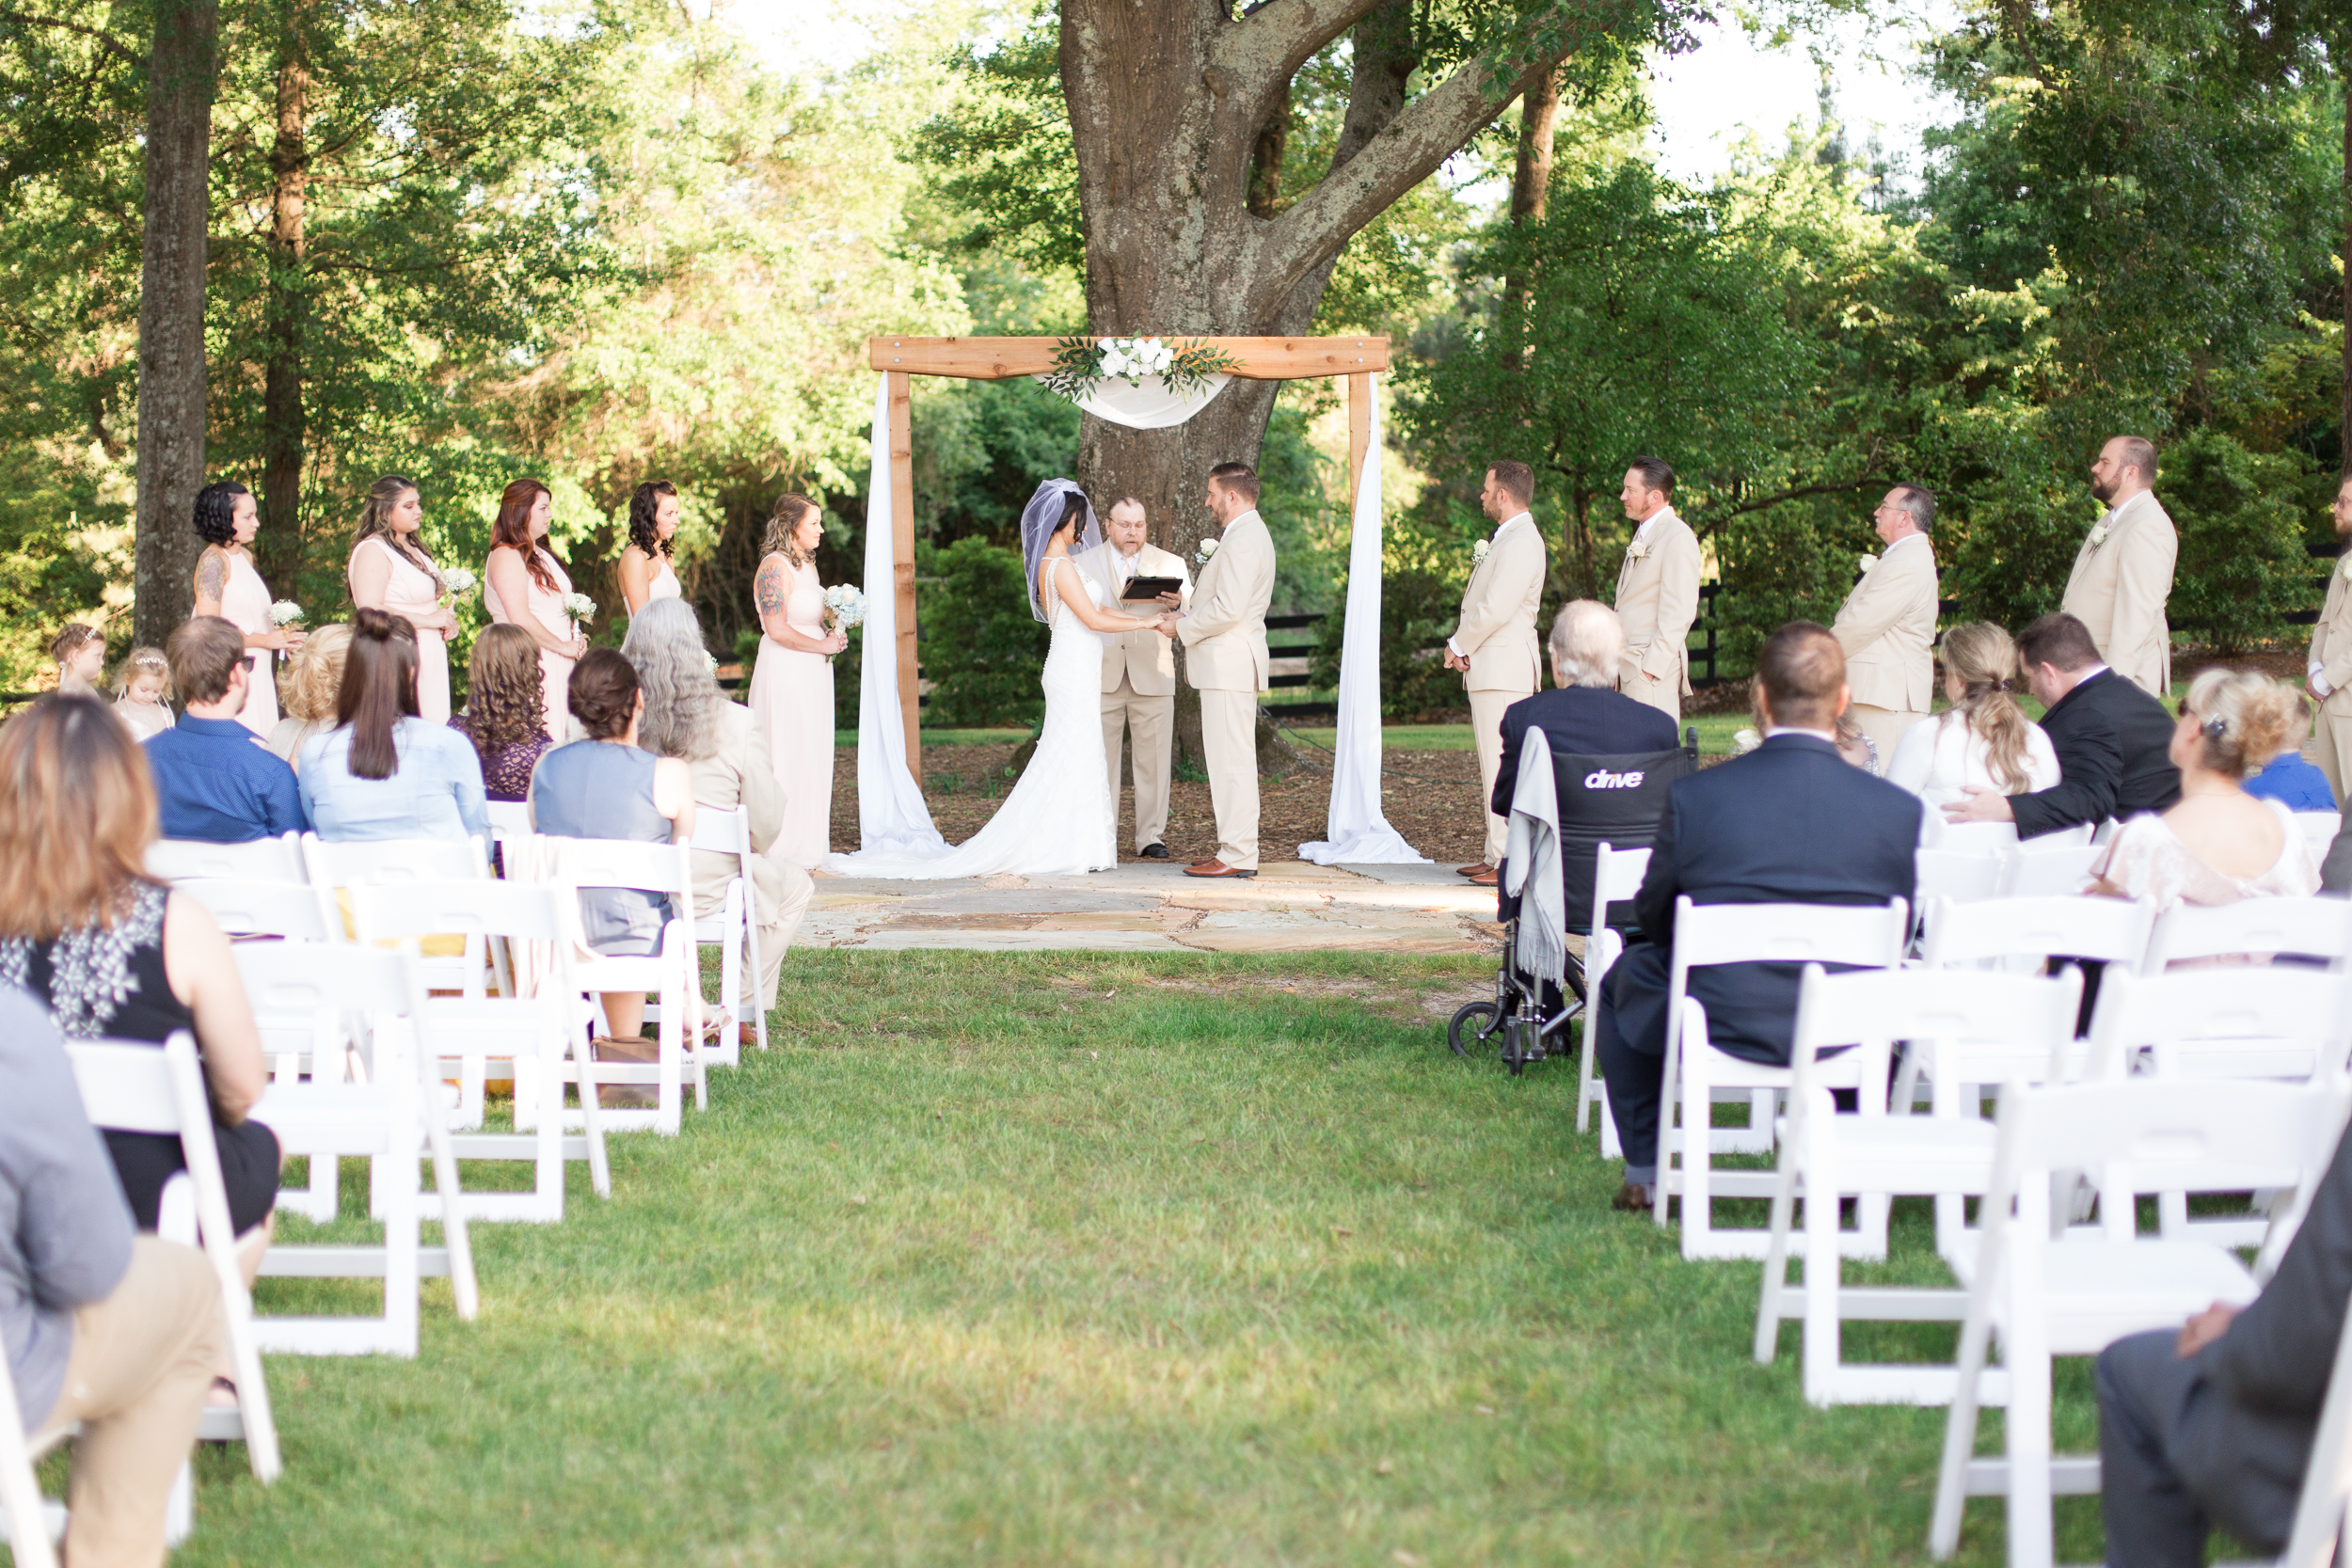 Zihlman-East TX Wedding_Kelsie Hendricks Photography_The Folmar Tyler Texas-105.jpg